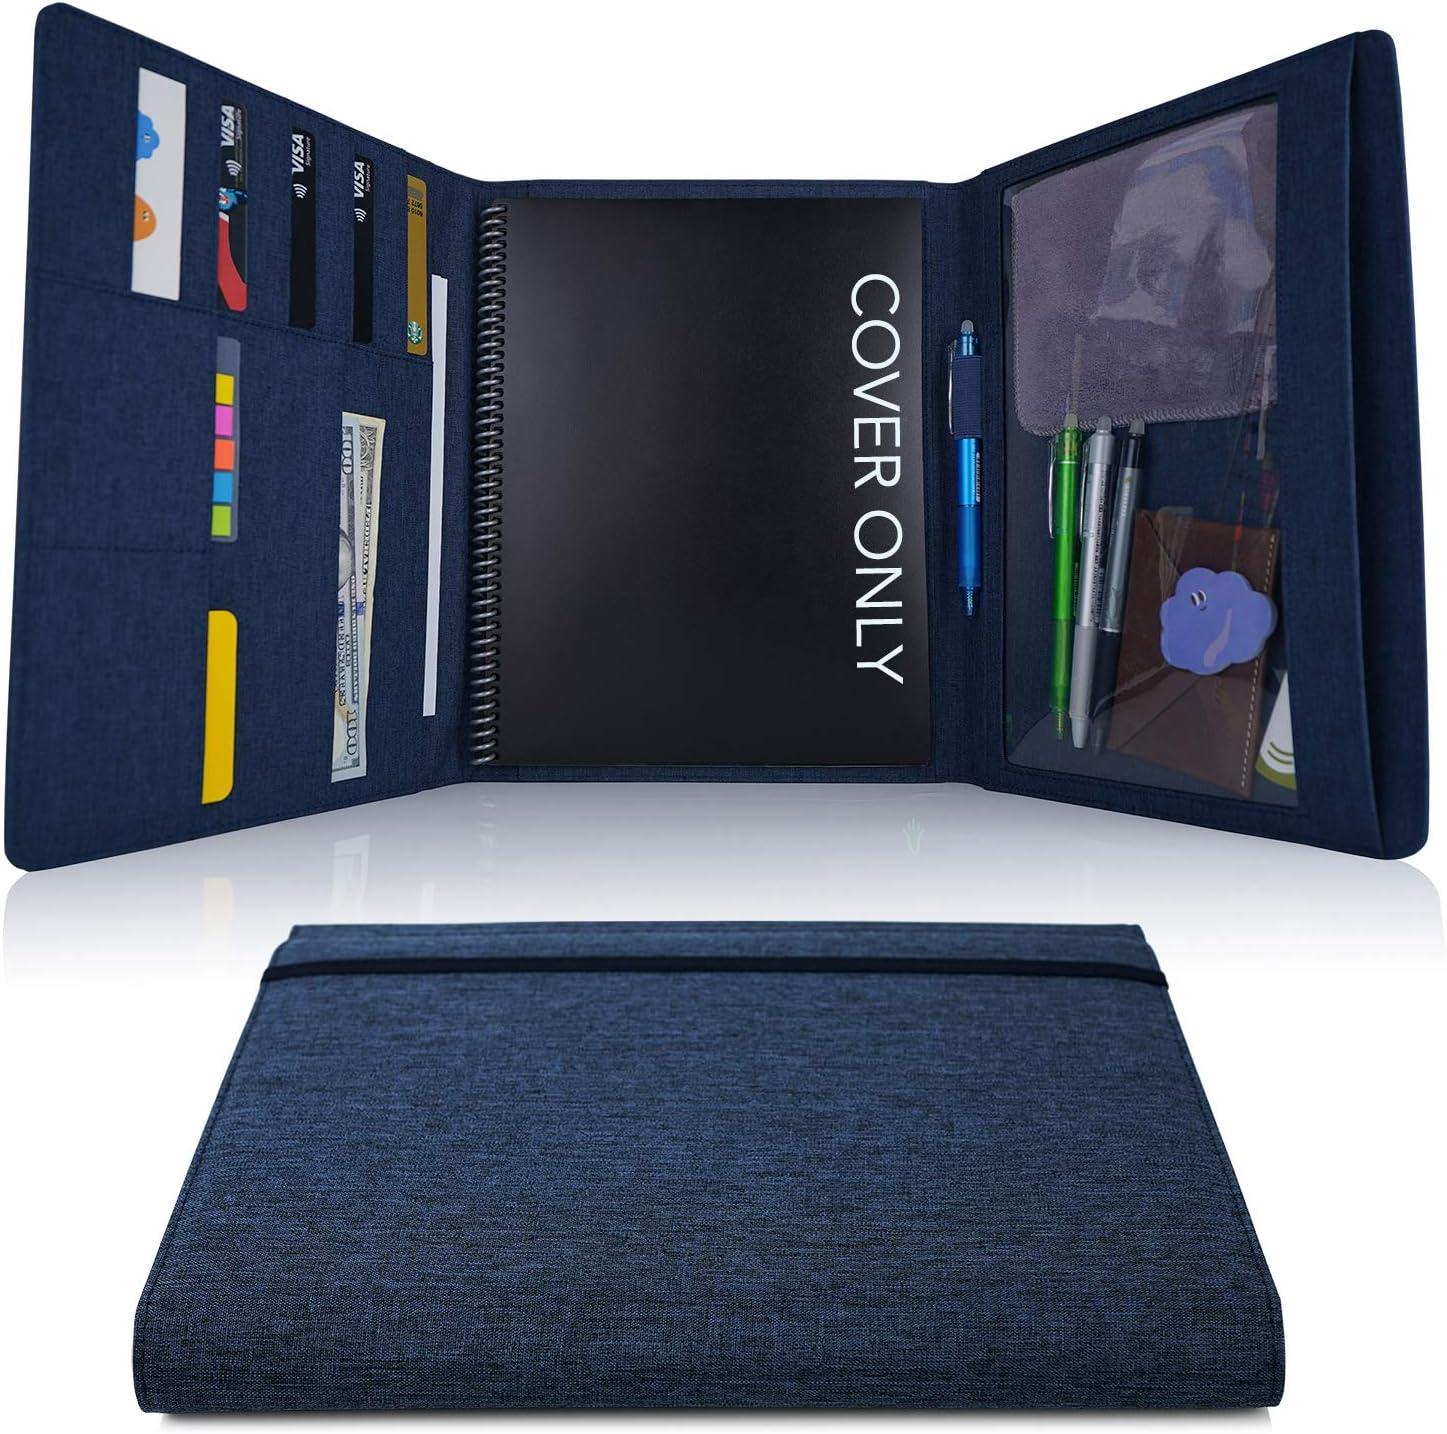 Kaitiaki 5 ☆ popular Folio Cover Compatible with 4 years warranty E Rocketbook Panda Fusion